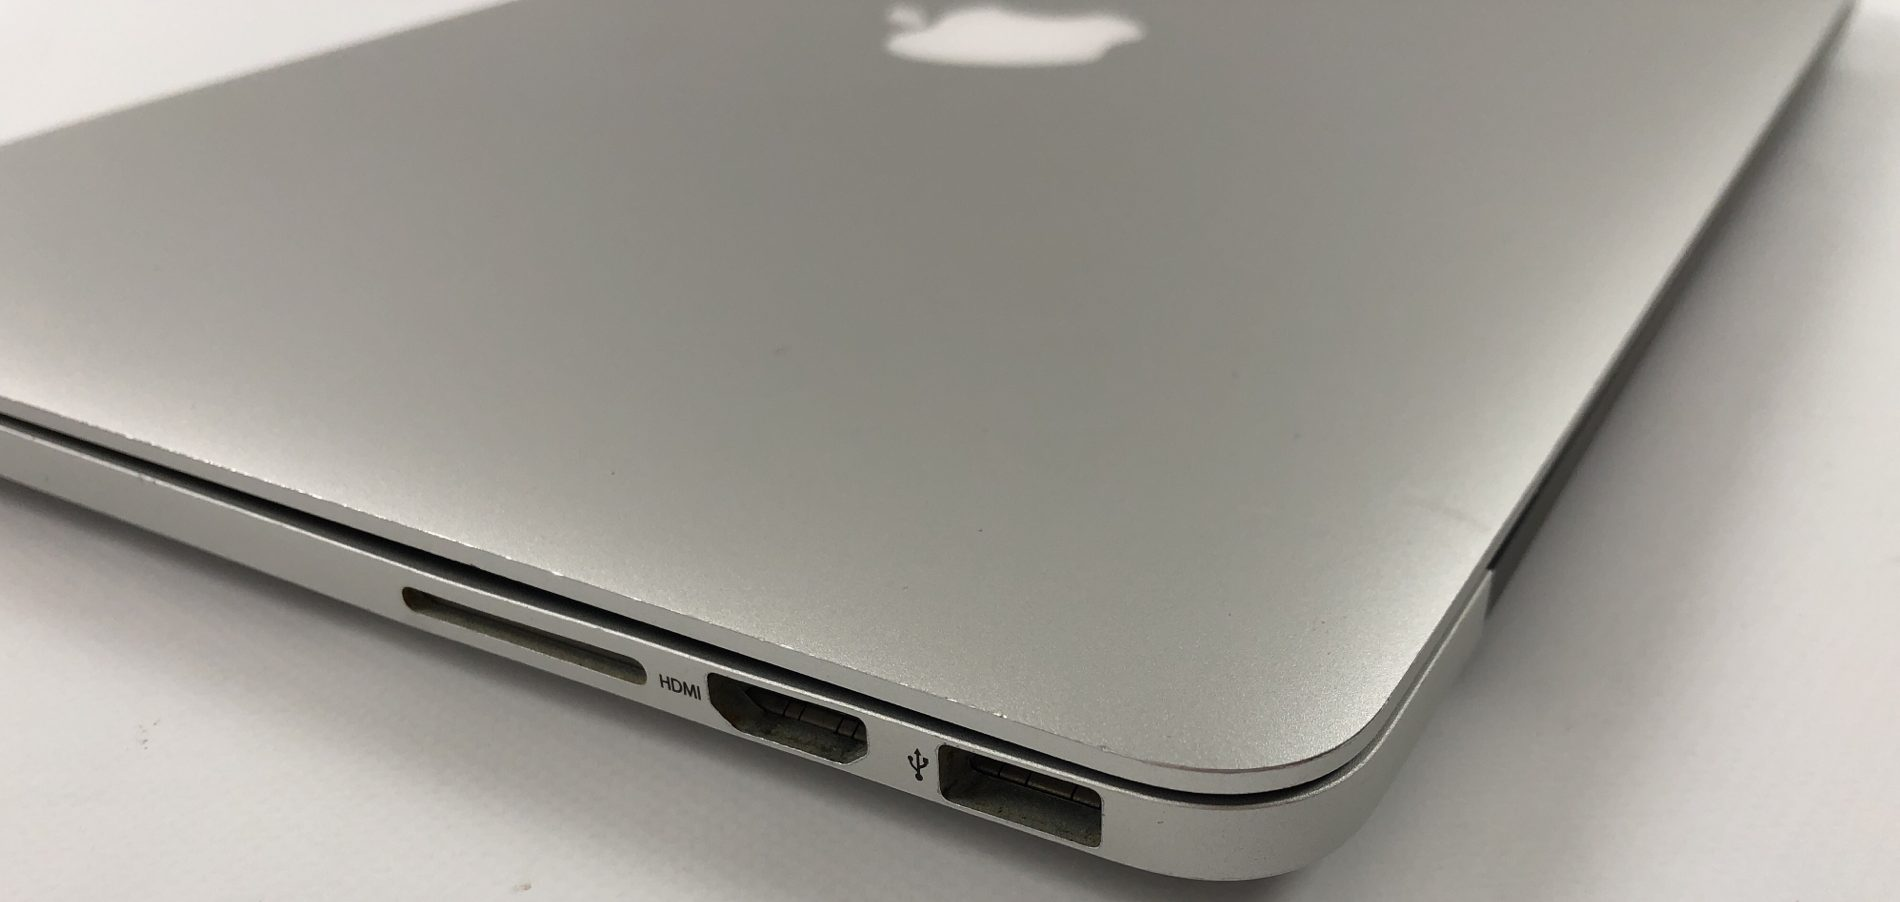 "MacBook Pro Retina 13"" Early 2015 (Intel Core i5 2.7 GHz 16 GB RAM 256 GB SSD), Intel Core i5 2.7 GHz, 16 GB RAM, 256 GB SSD, Kuva 3"